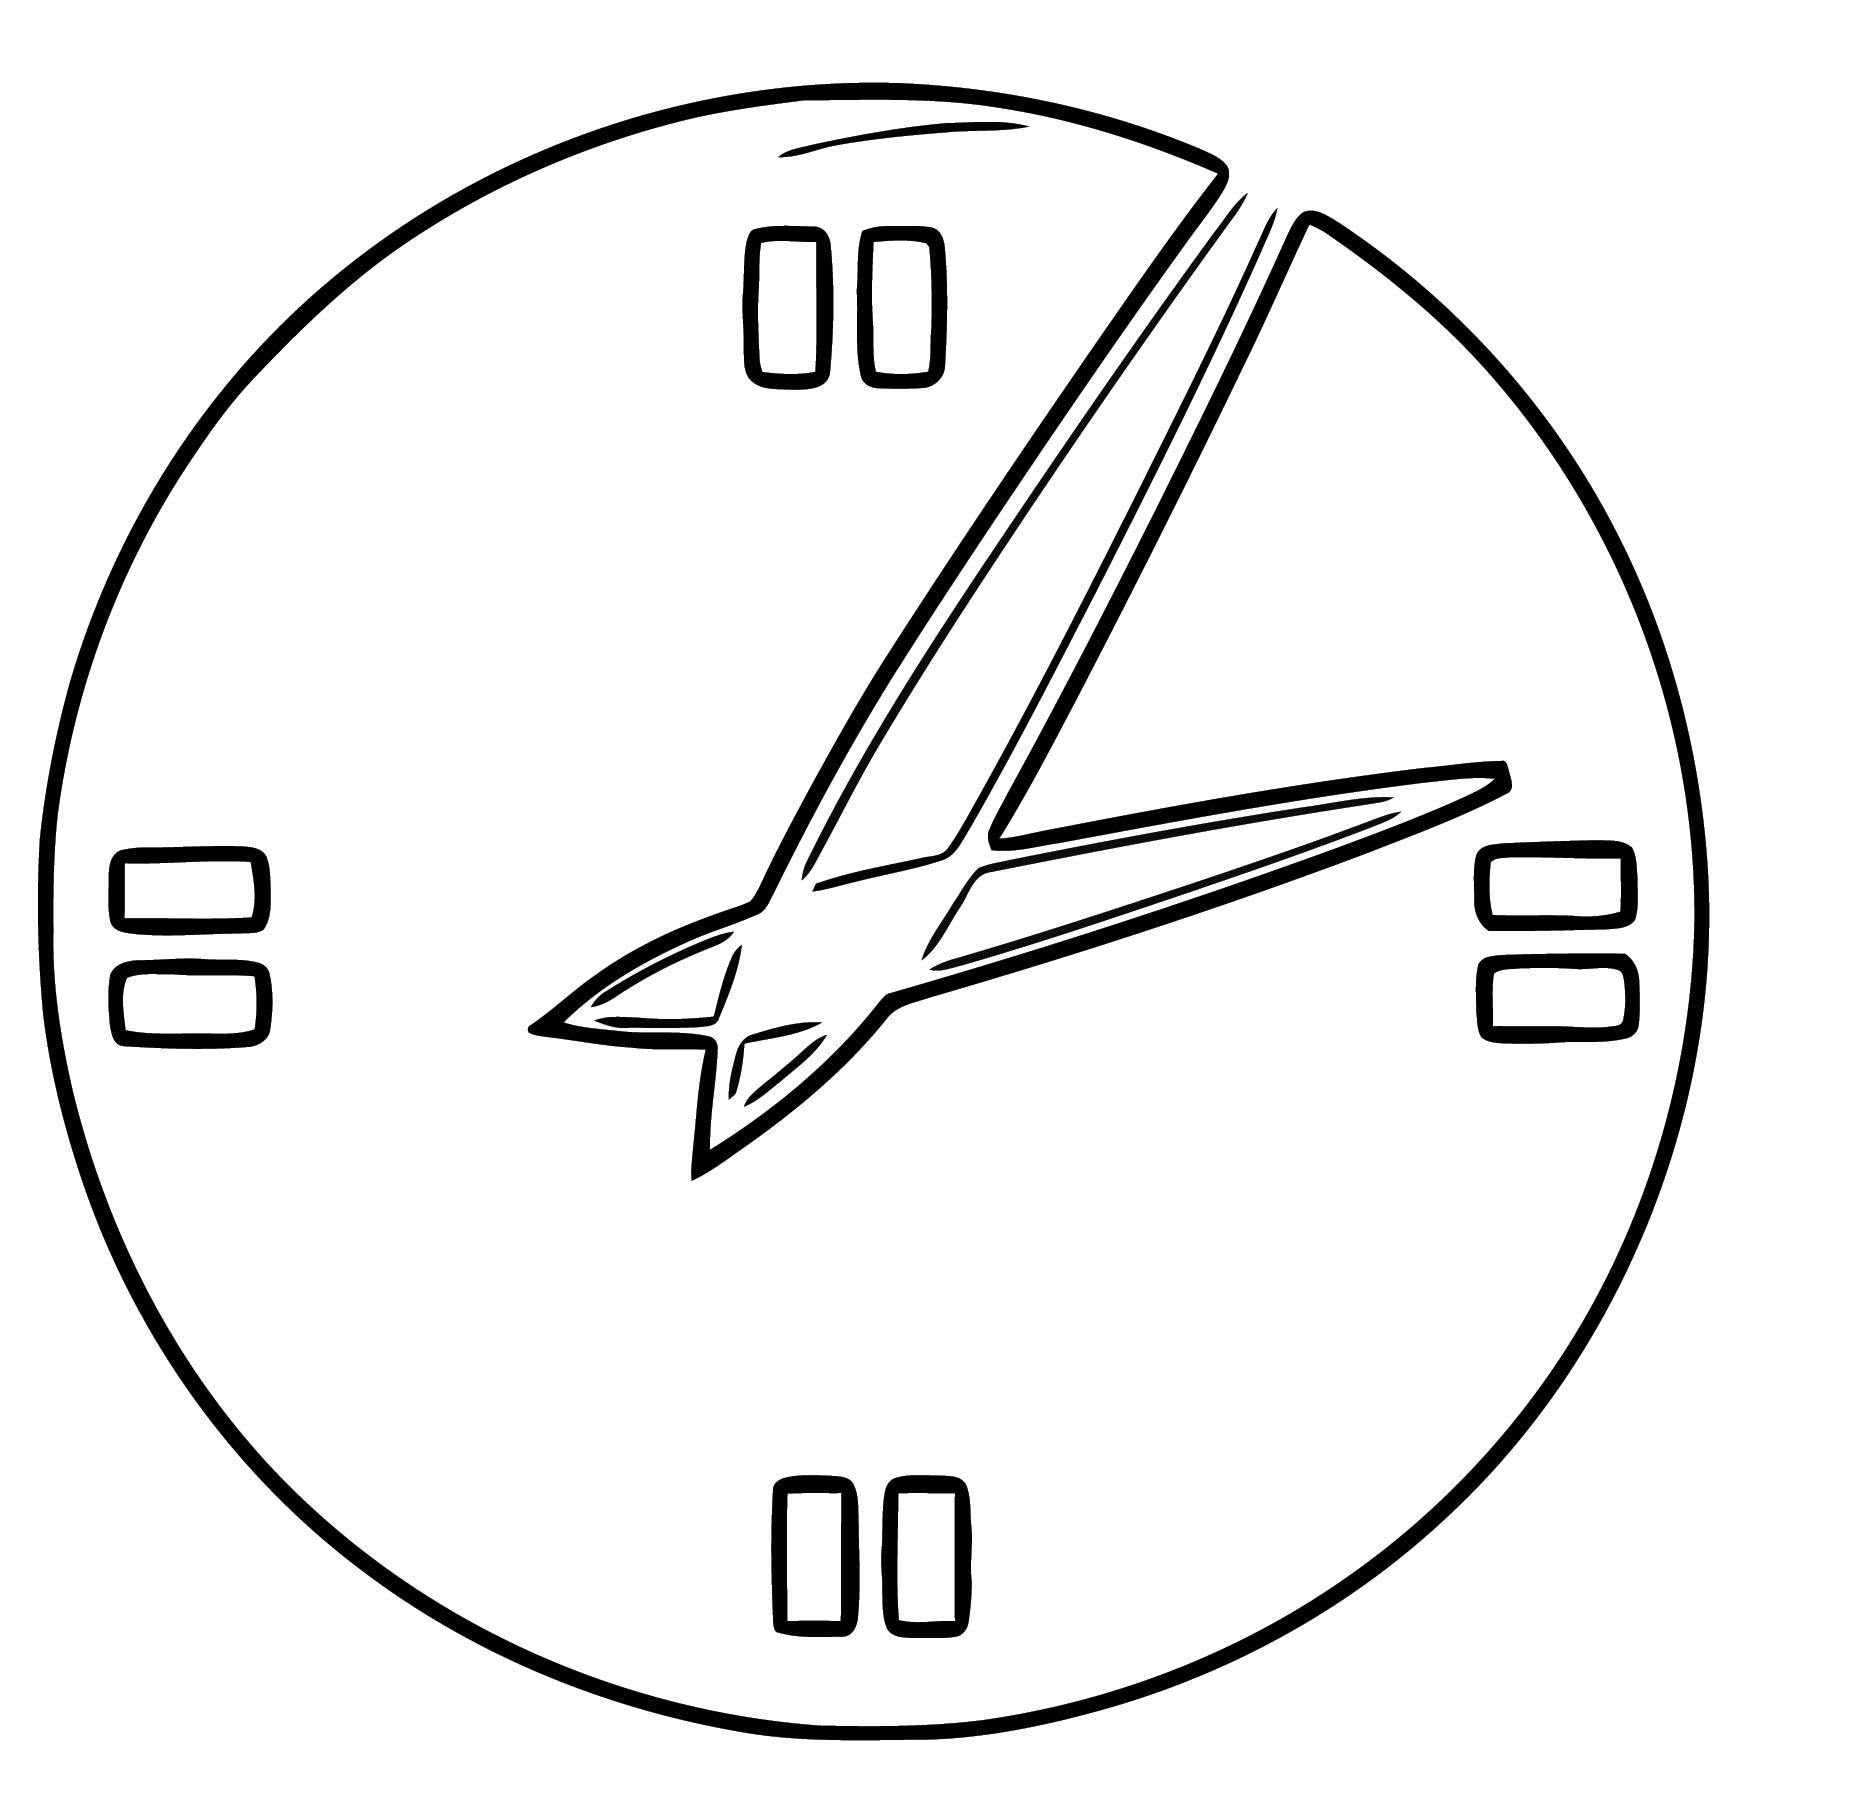 Clock Free Printable Hi Cartoonized Free Printable Coloring Page